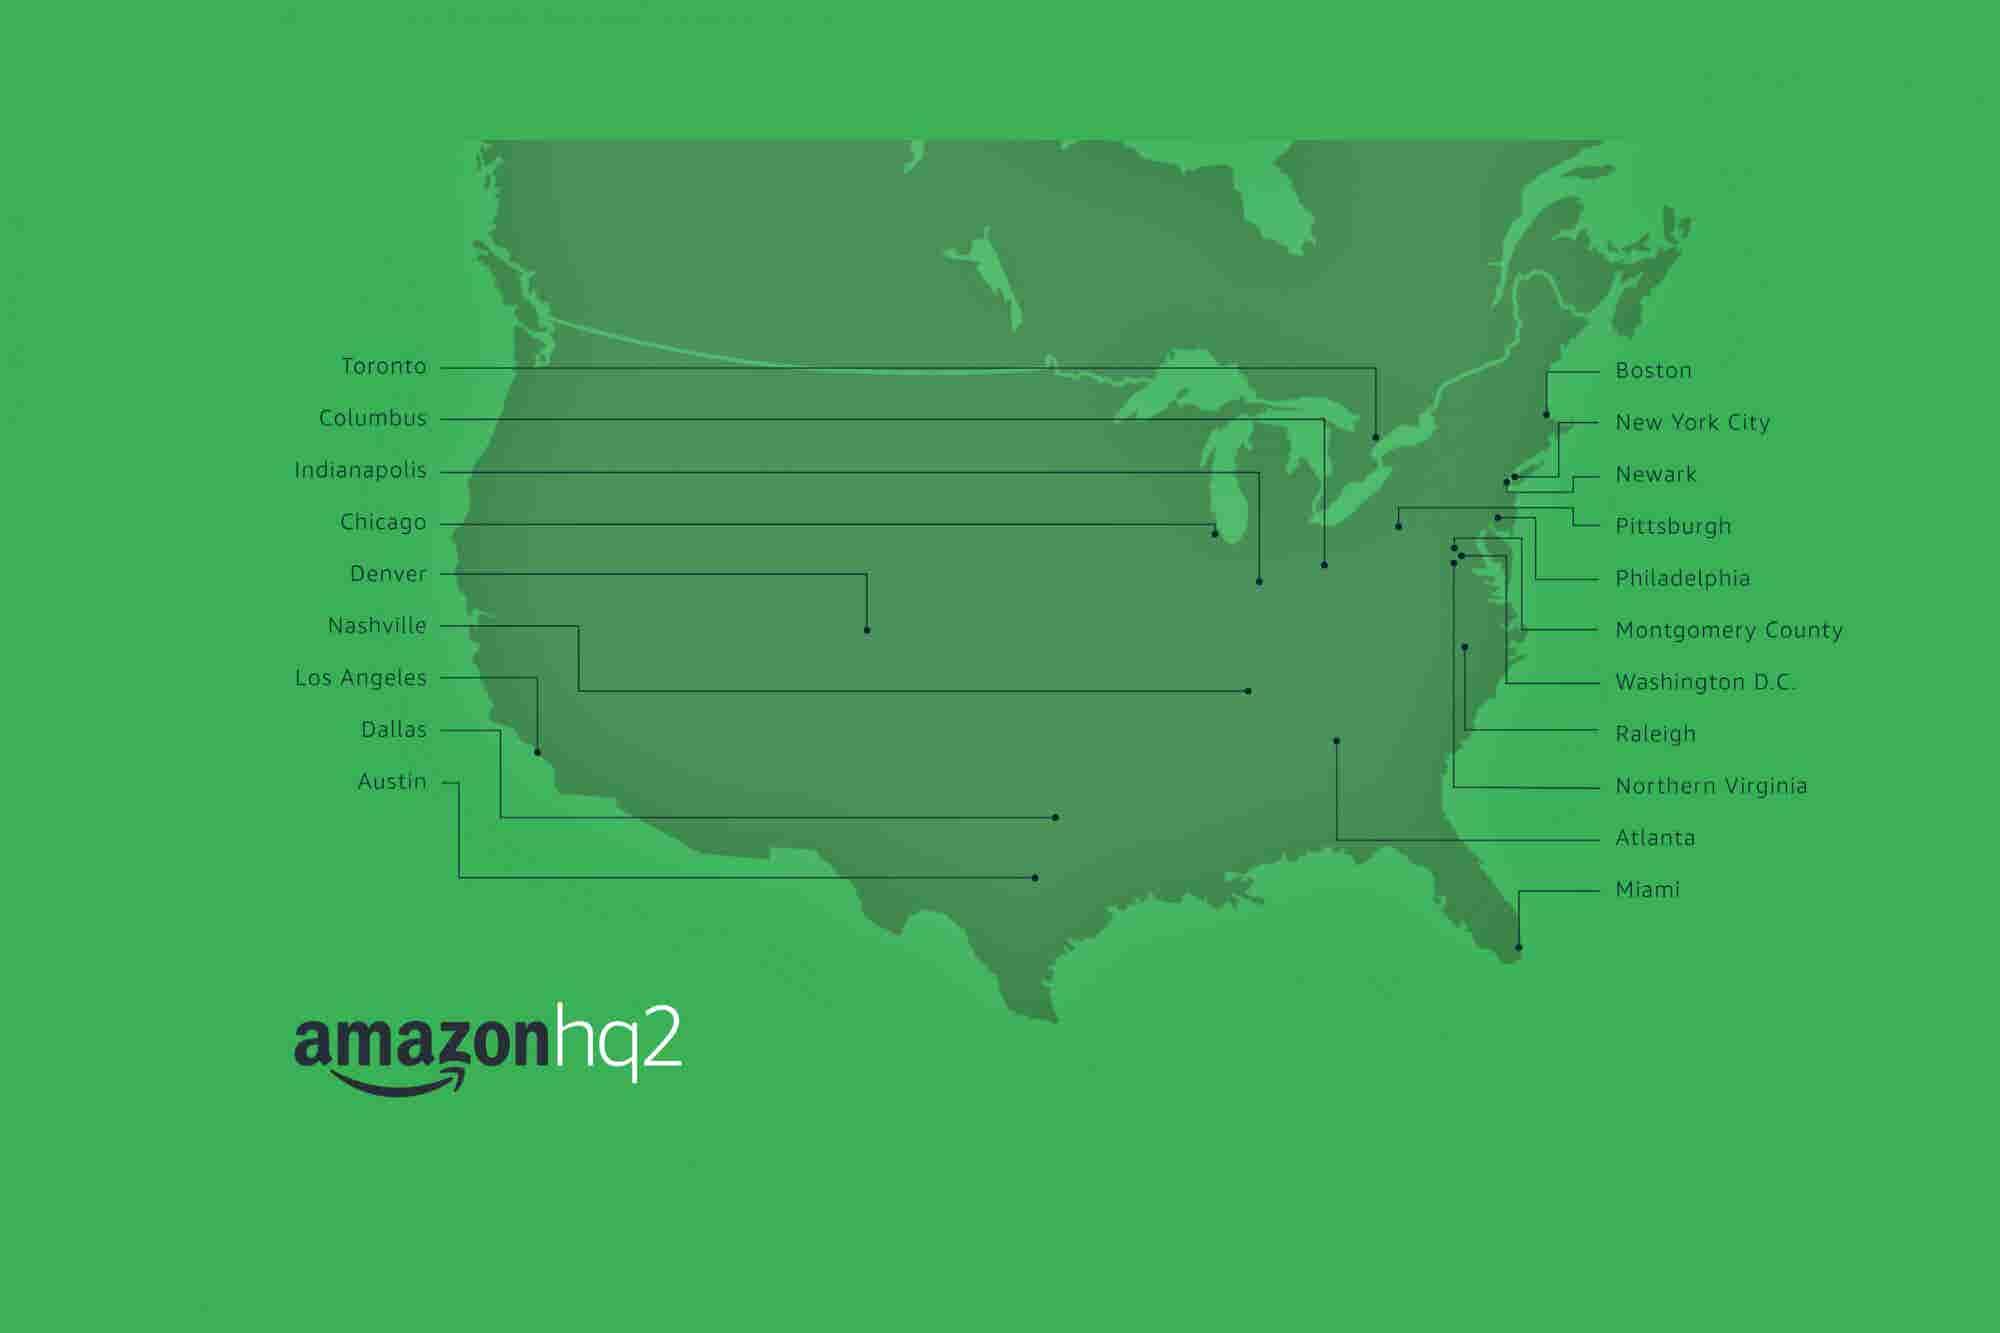 Amazon May Split HQ2 Between Crystal City, Va., and Long Island City, N.Y.